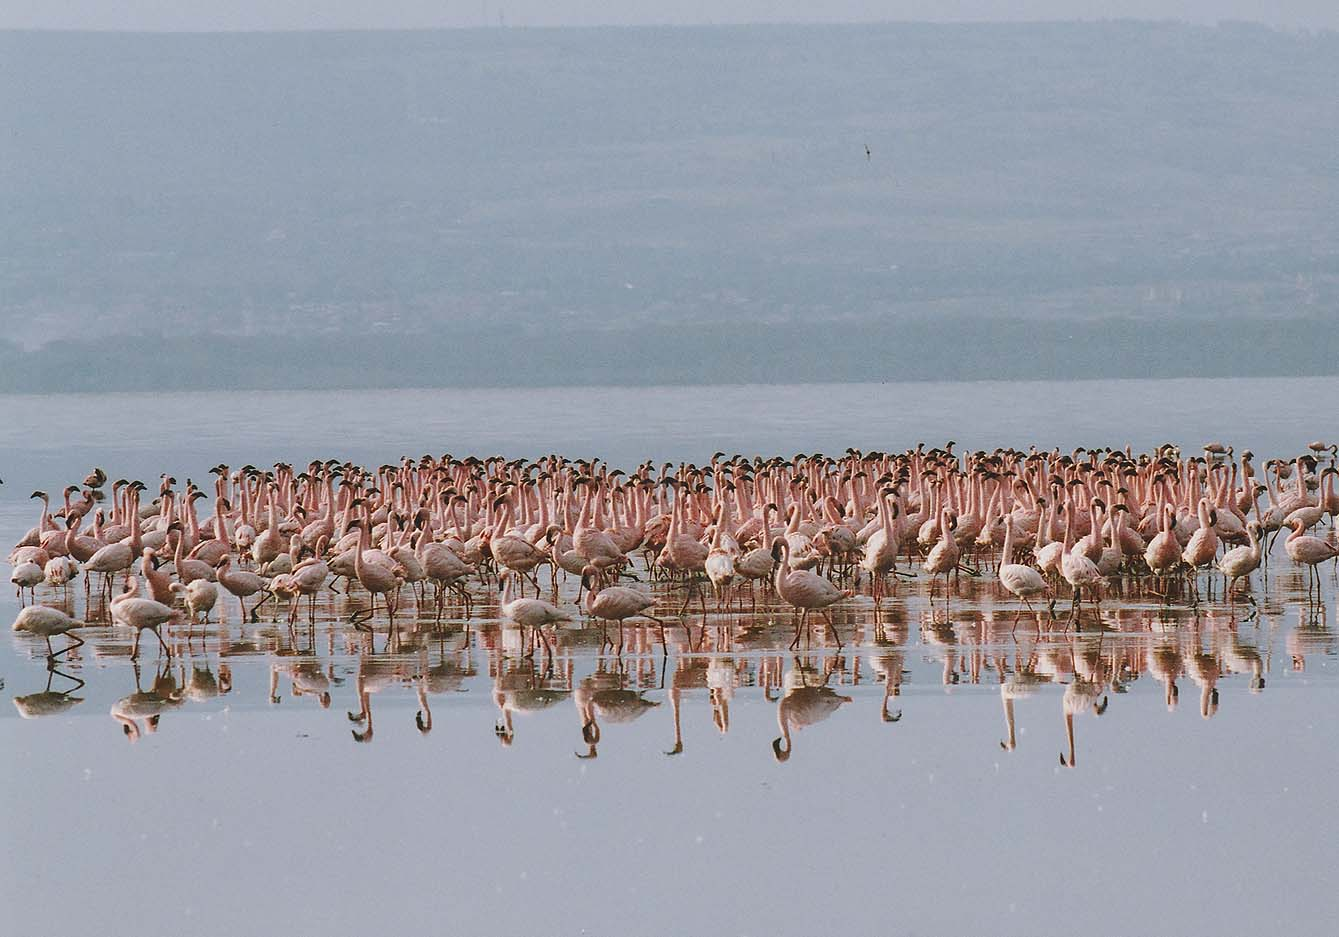 http://www.beautiful-nature.net/travels/0525-1.jpg